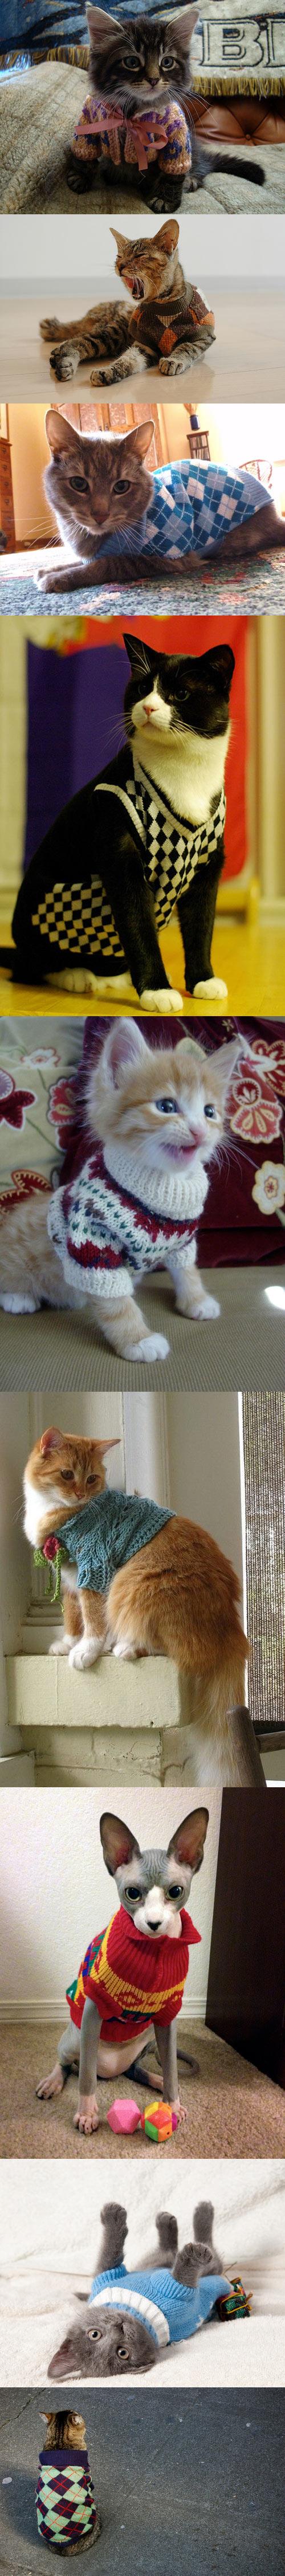 Gatos con jerseys